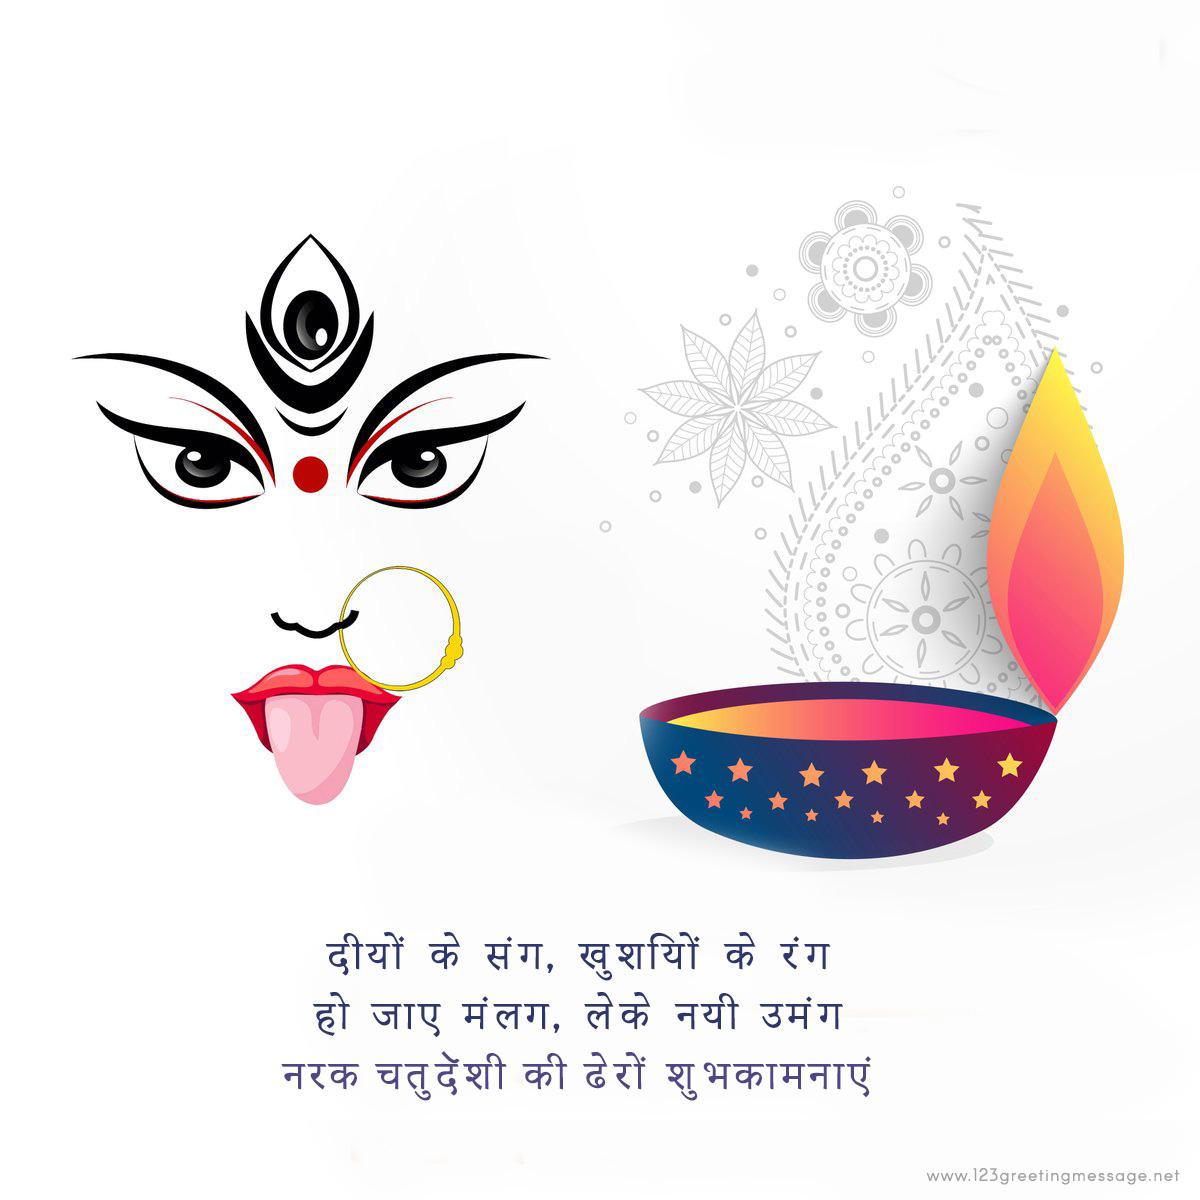 Happy Kali Chaudas Messages Wishes